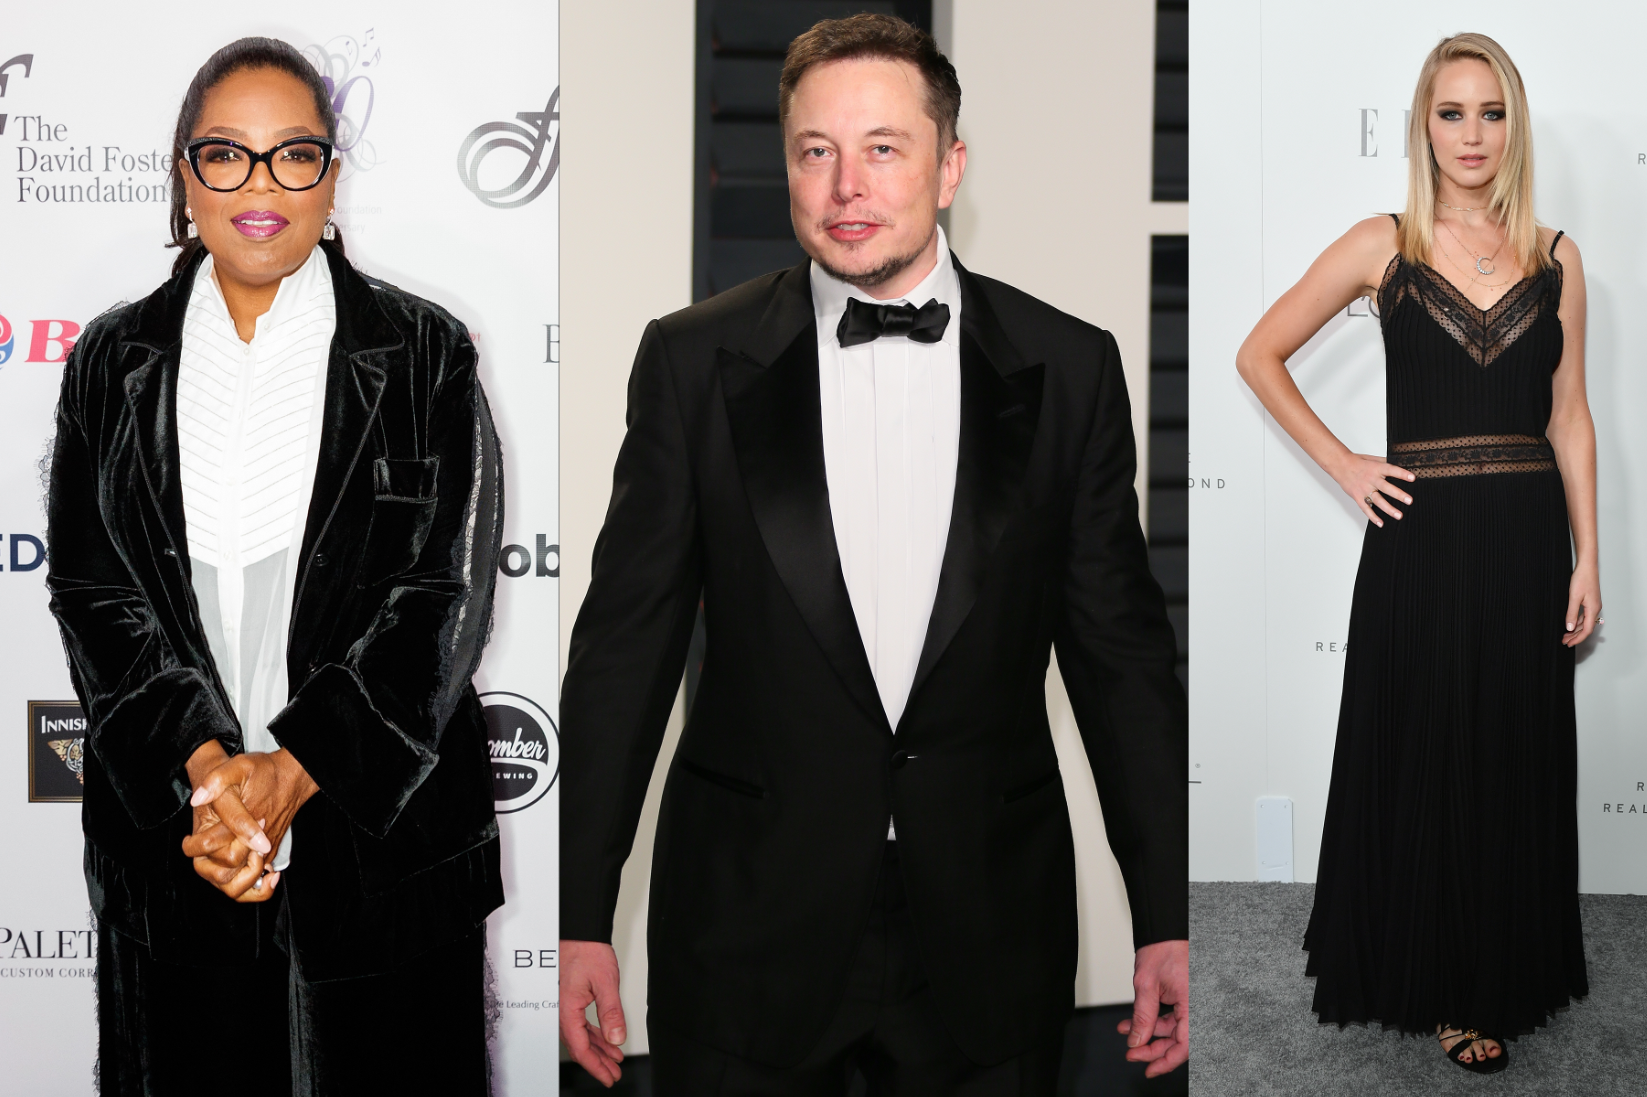 Oprah Winfrey, Elon Musk, and Jennifer Lawrence